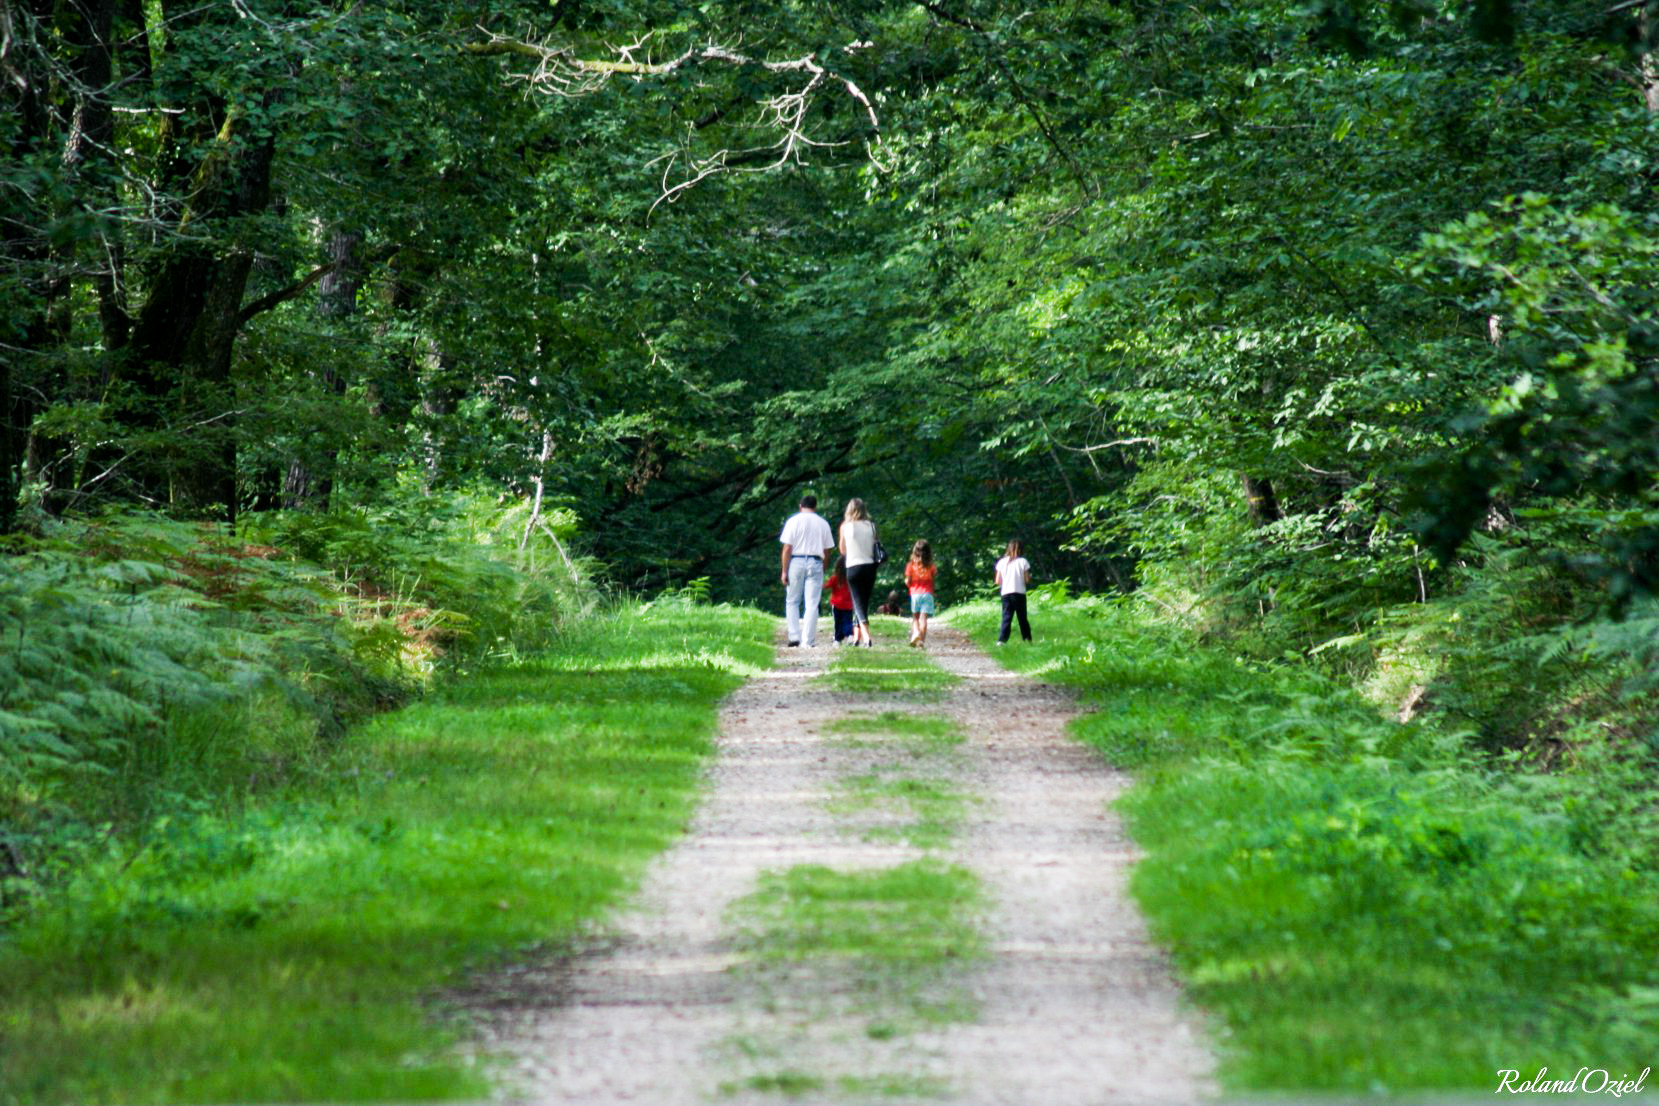 Randonnée ou balade en forêt de Mervent